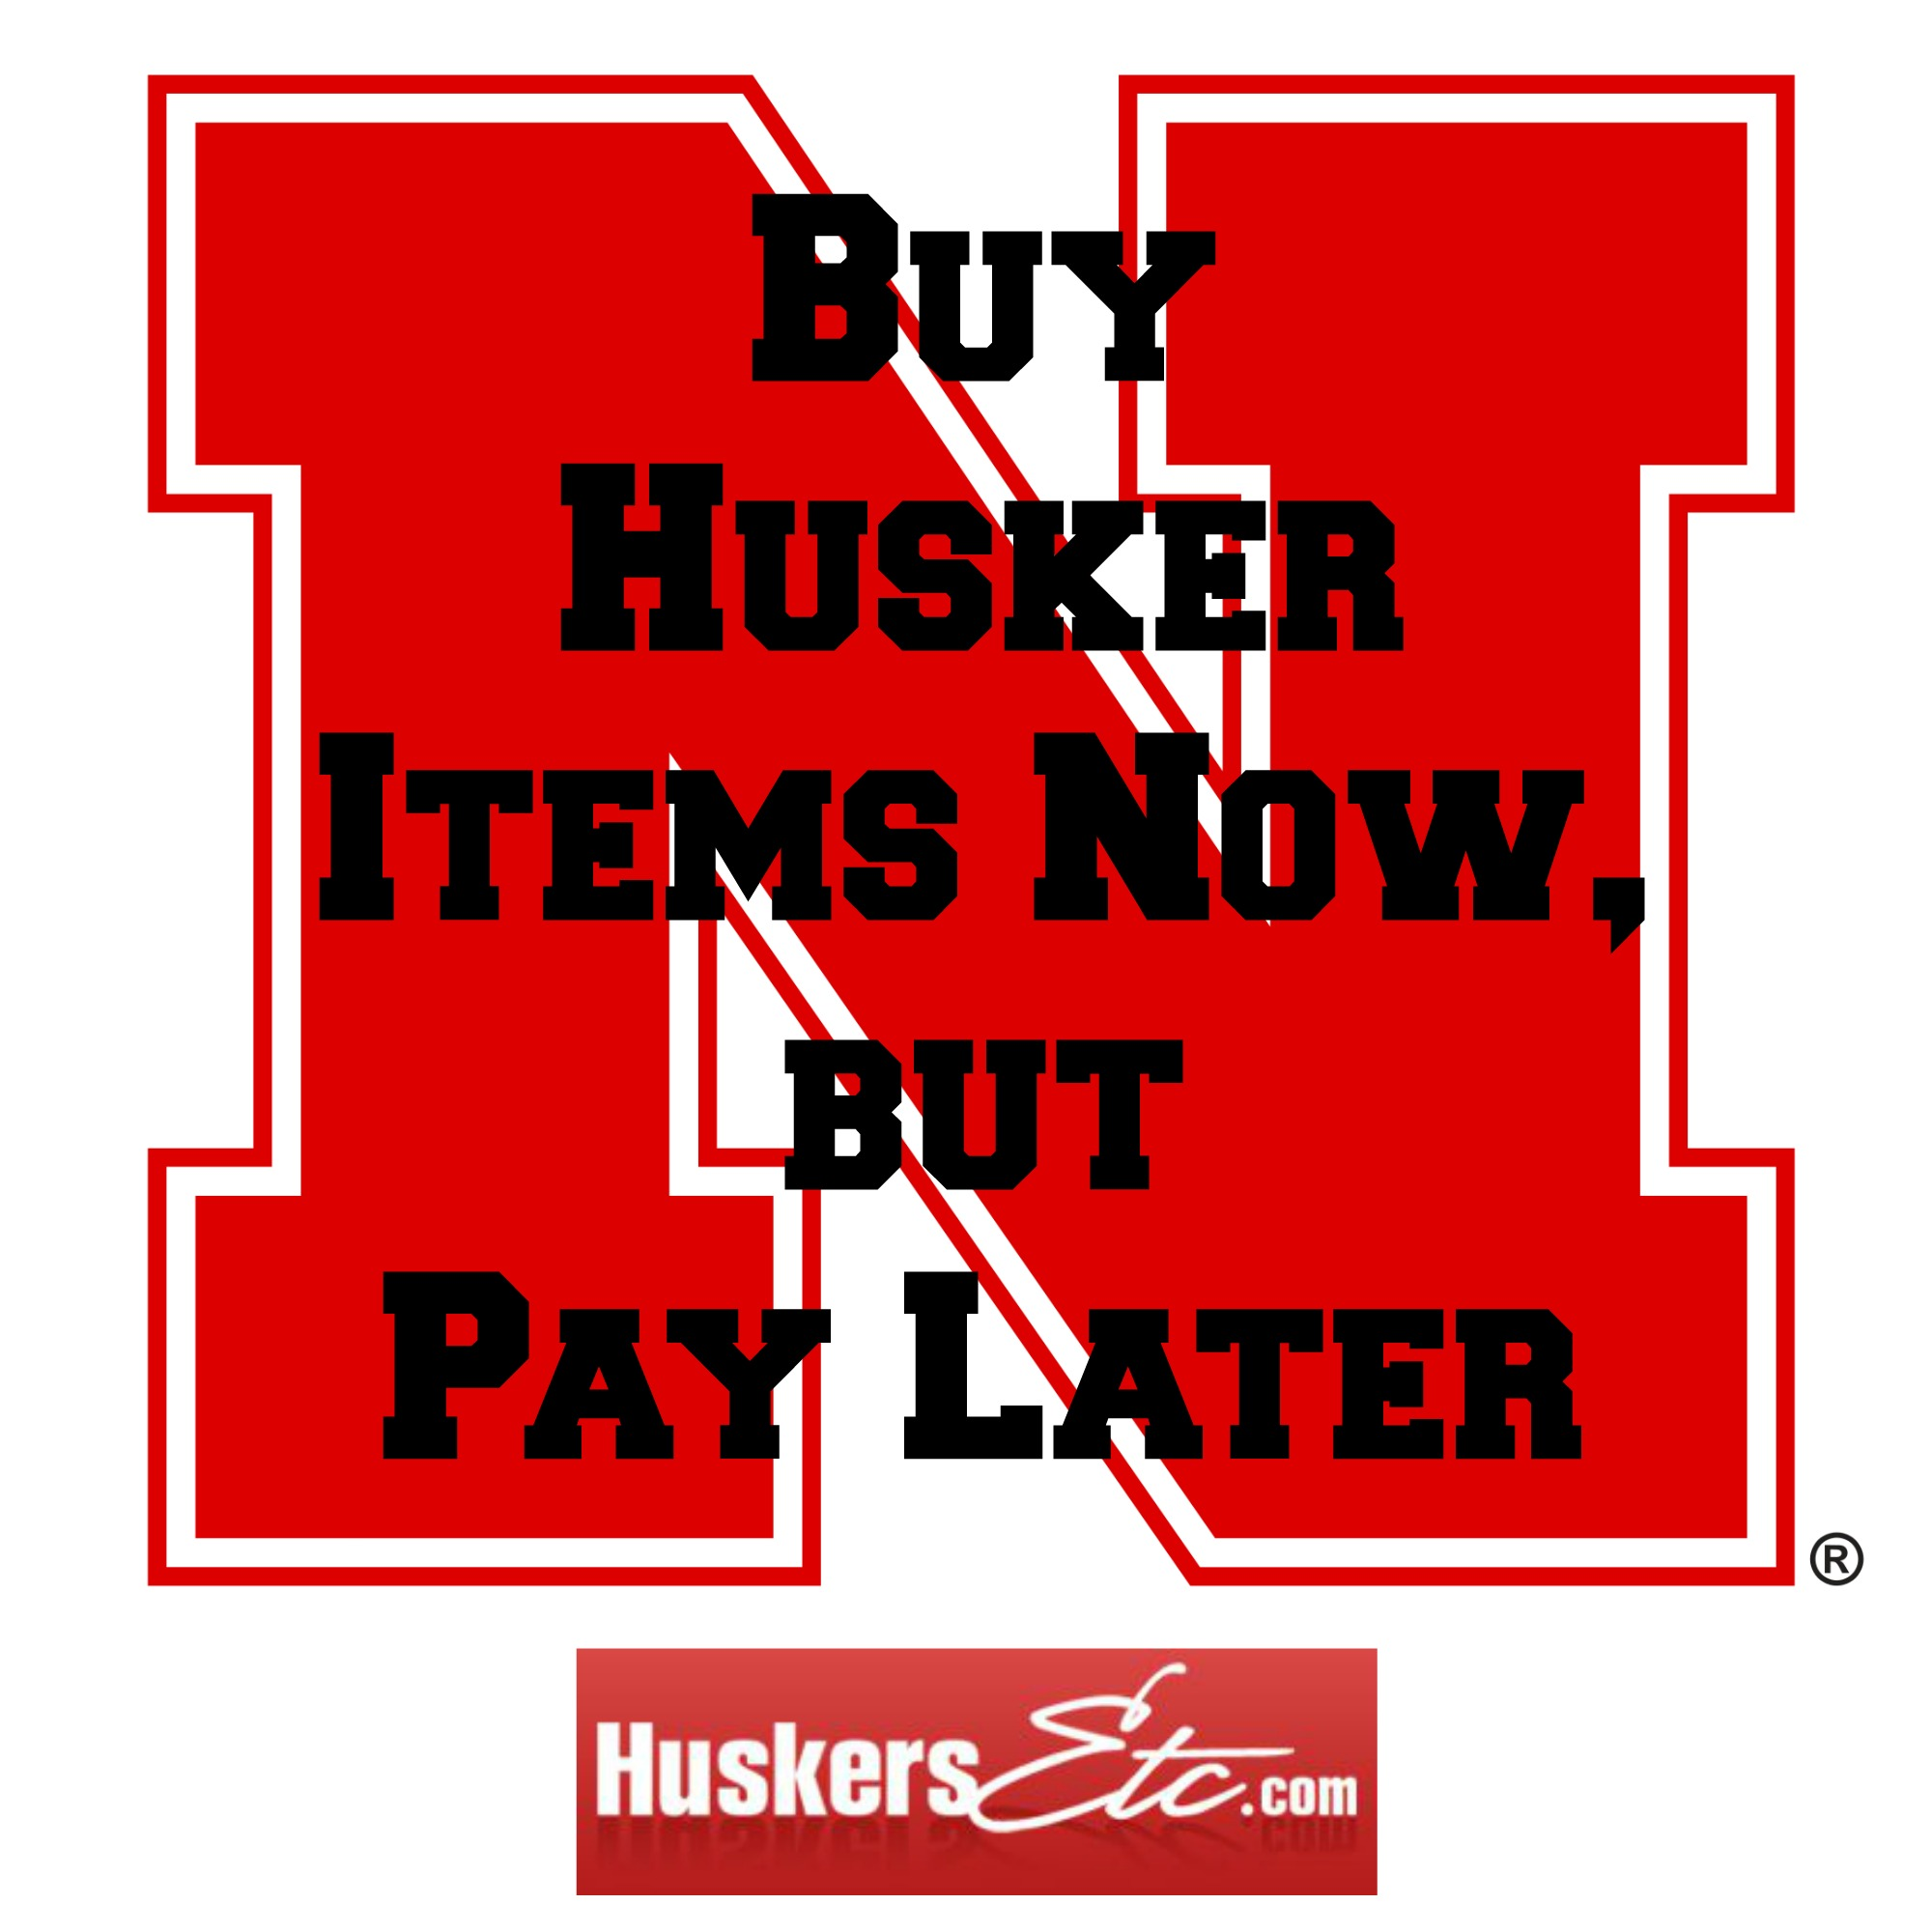 Buy Nebraska Husker Gifts Now, Pay Later